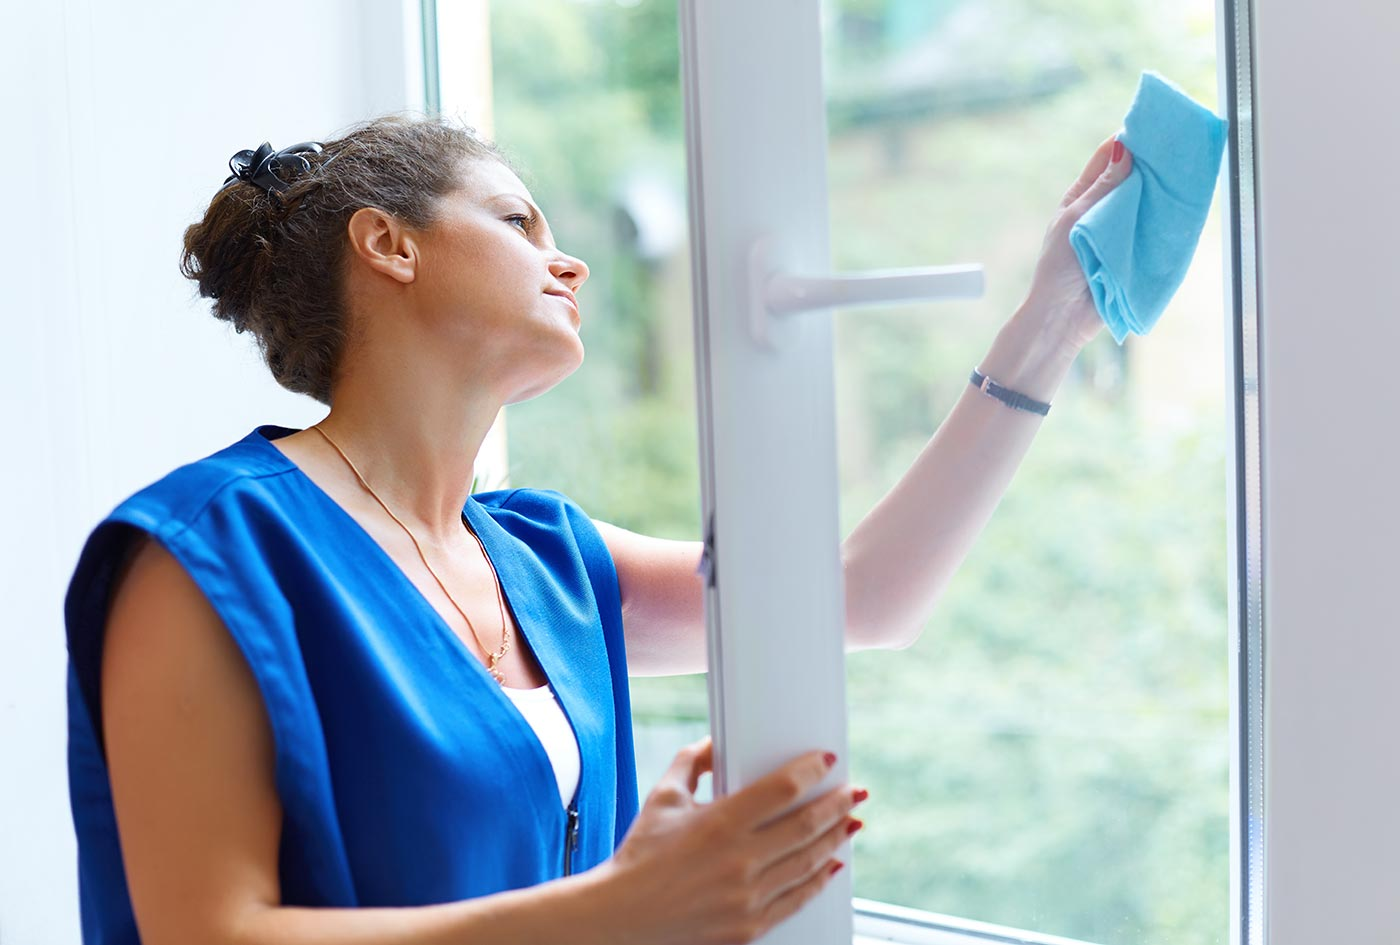 Seasoned House Keeper in Corpus Christi - Housekeeper in